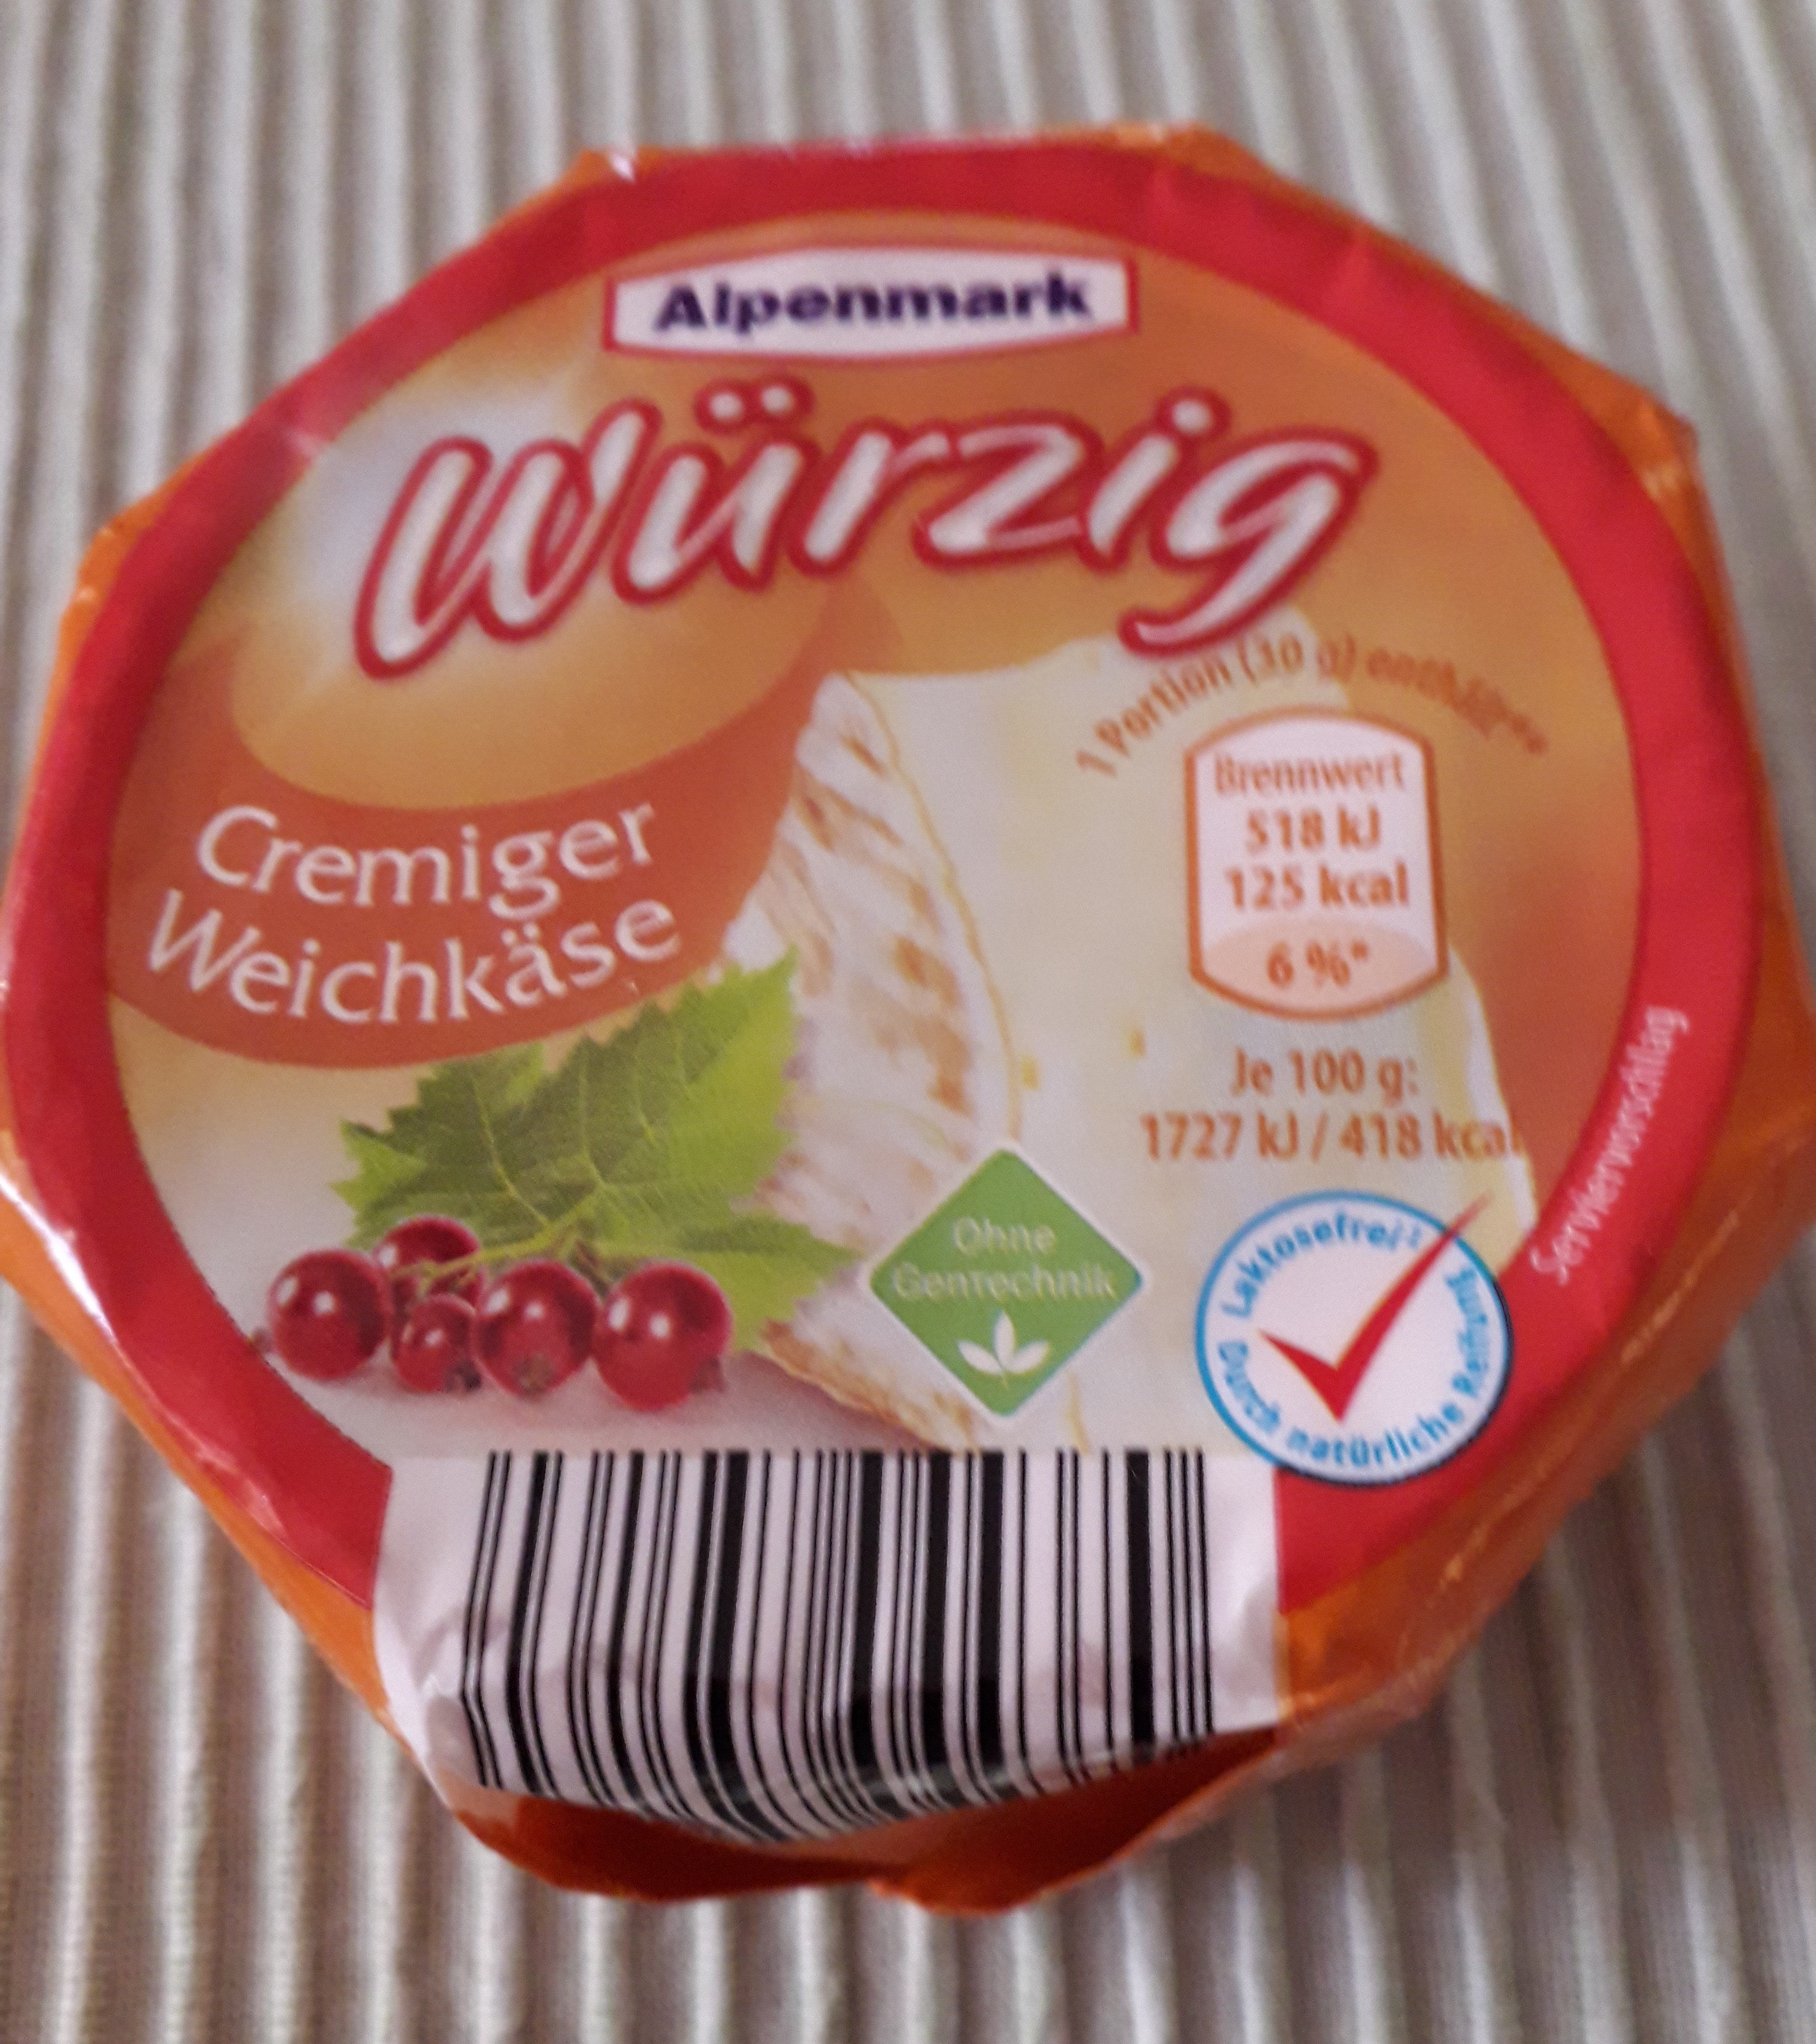 Cremiger Weichkäse würzig - Product - de